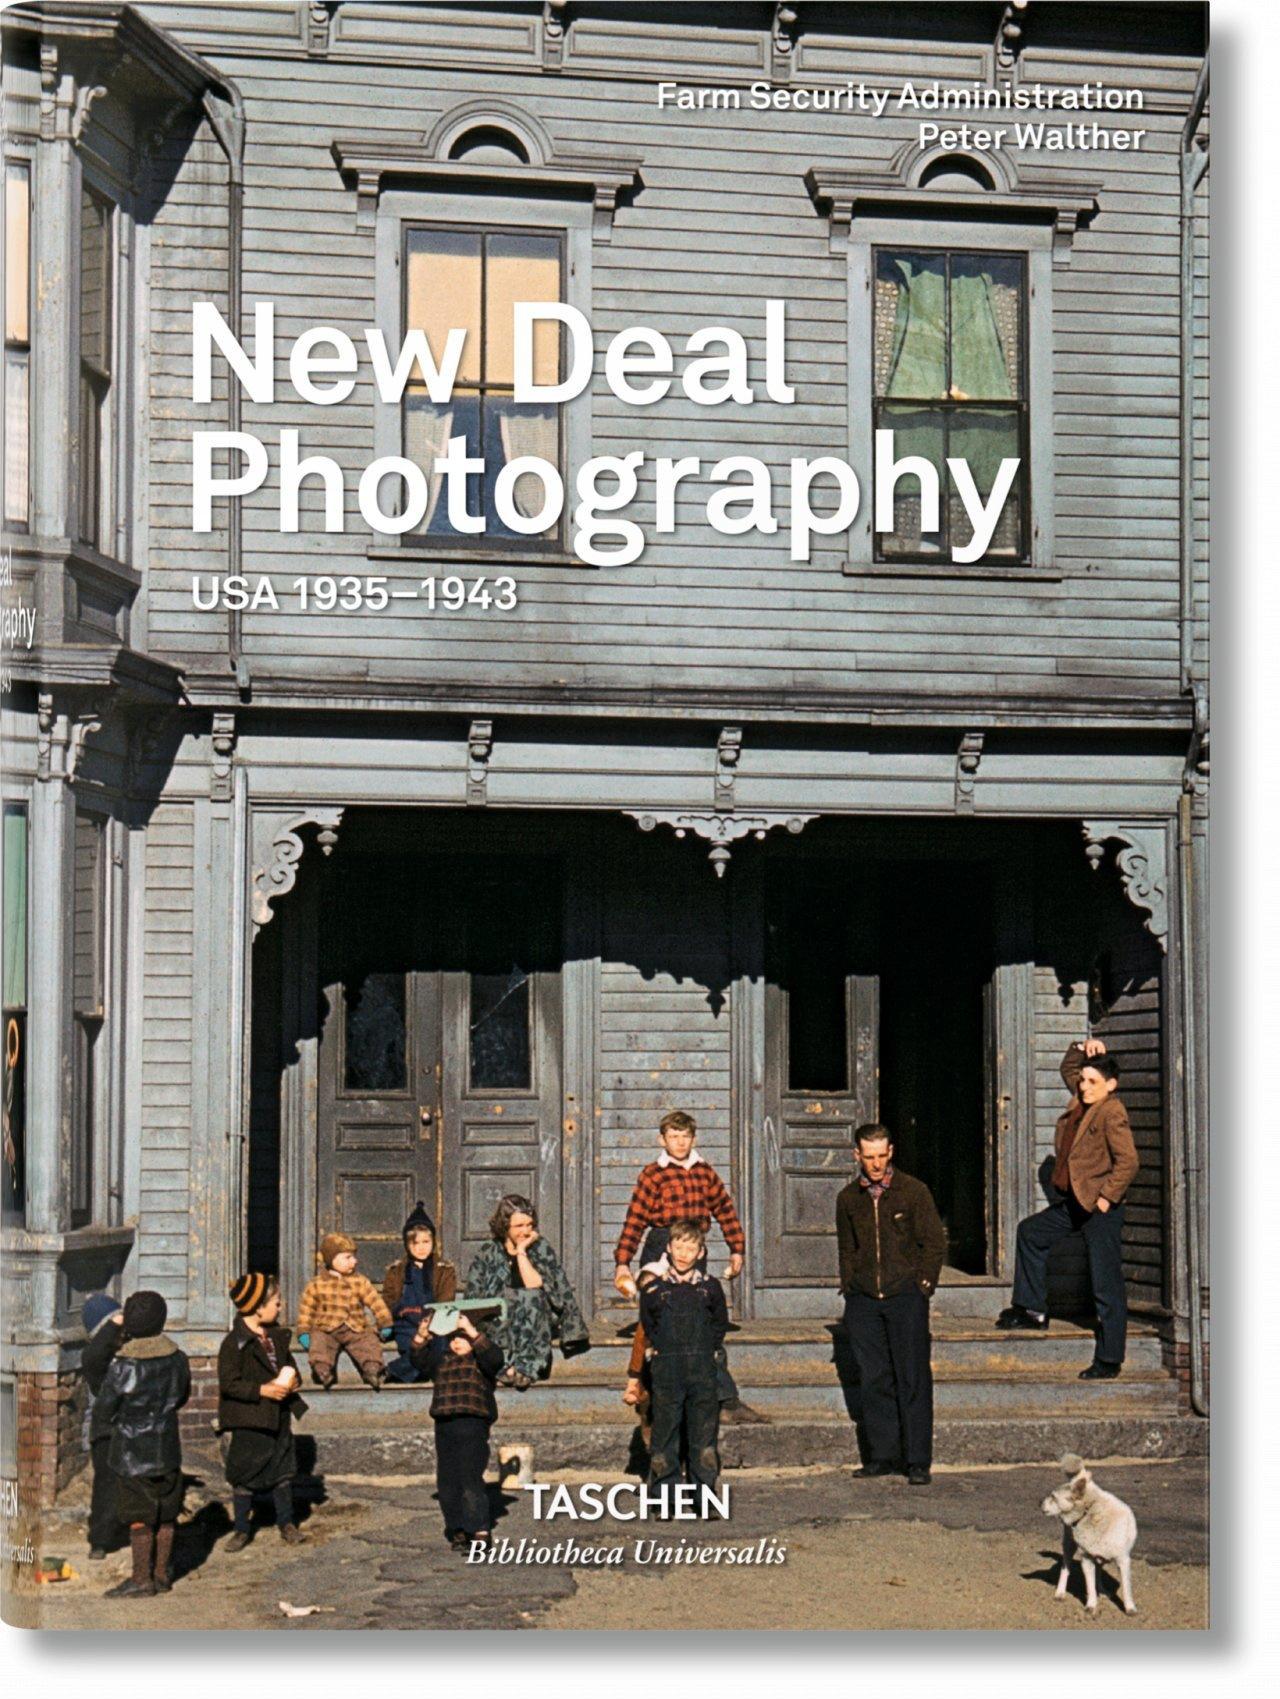 NEW DEAL PHOTOGRAPHY. USA 1935-1943 - BU